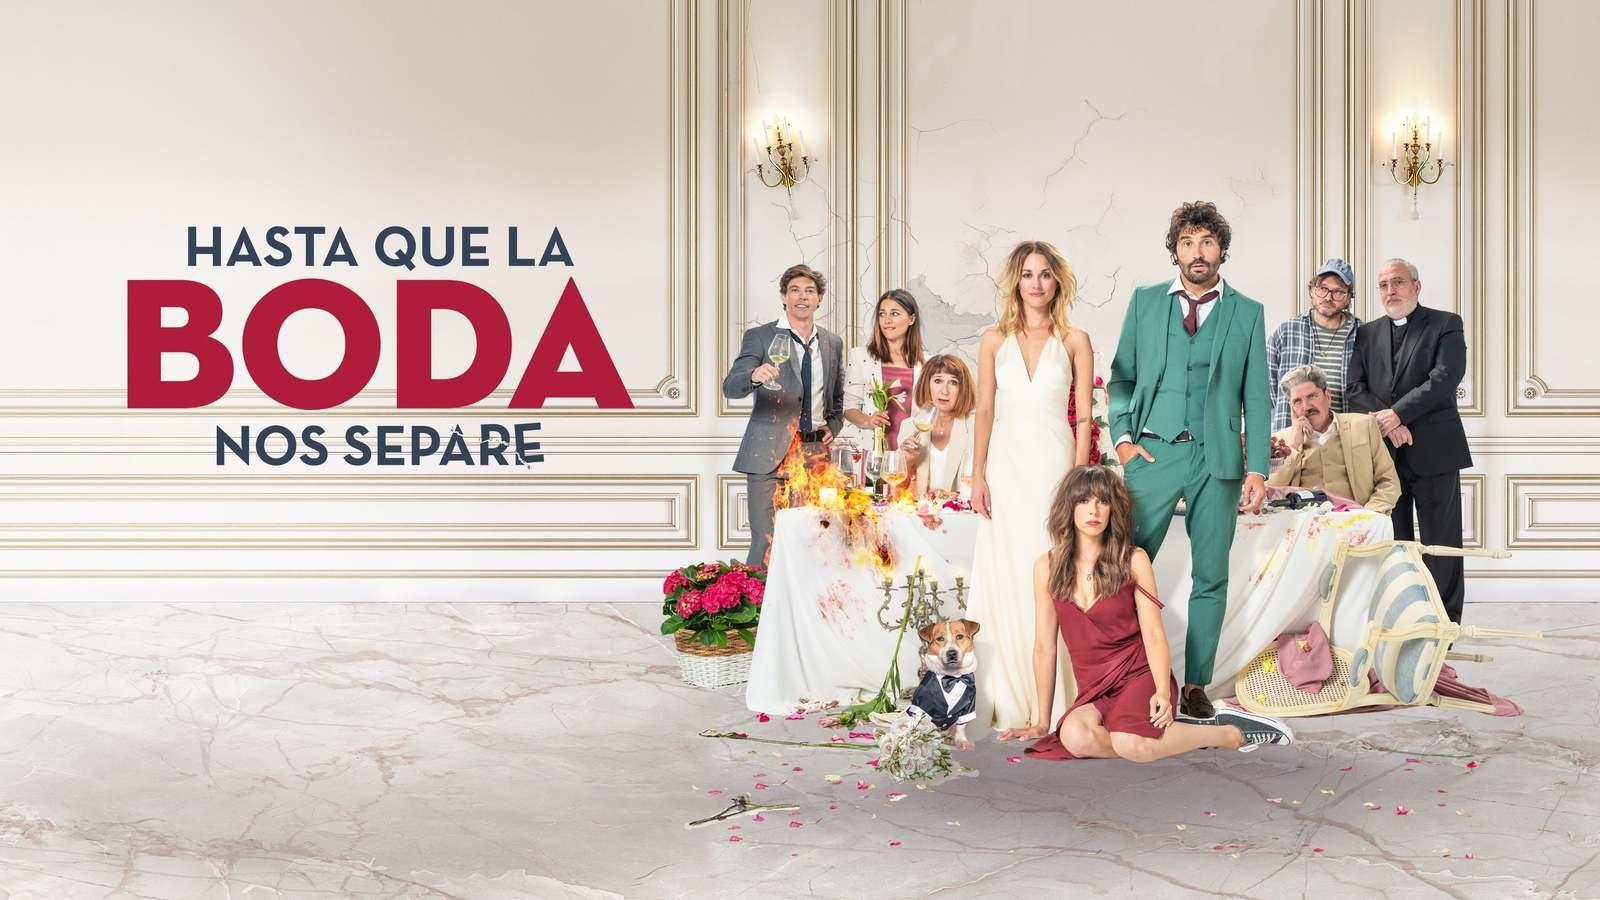 9 Pelicula Descargar Sub Español Ideas Free Movies Online Streaming Movies Online Full Movies